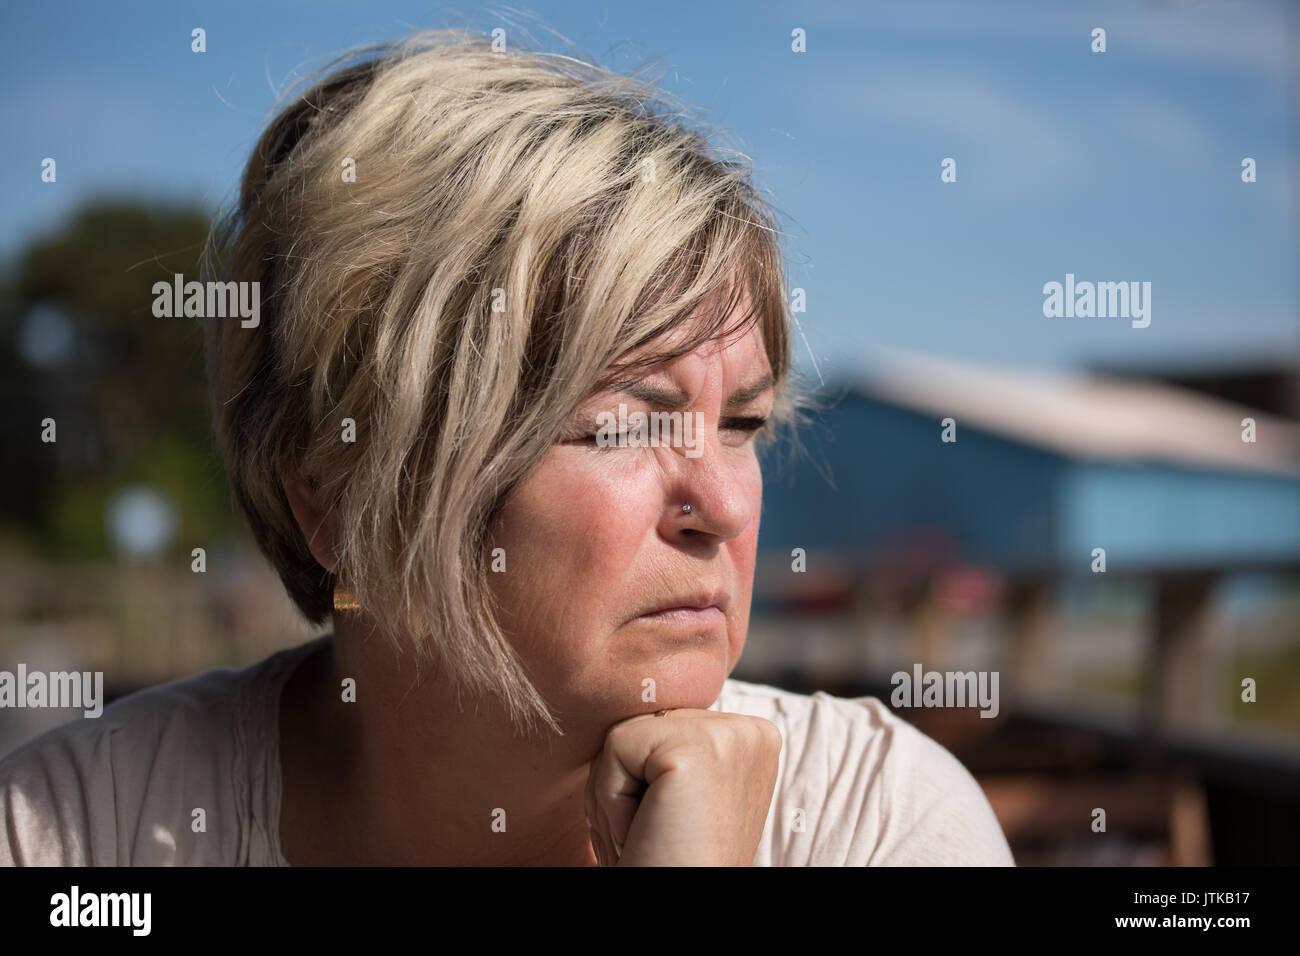 Contemplative mature Caucasian Swedish woman squinting into the sun. - Stock Image